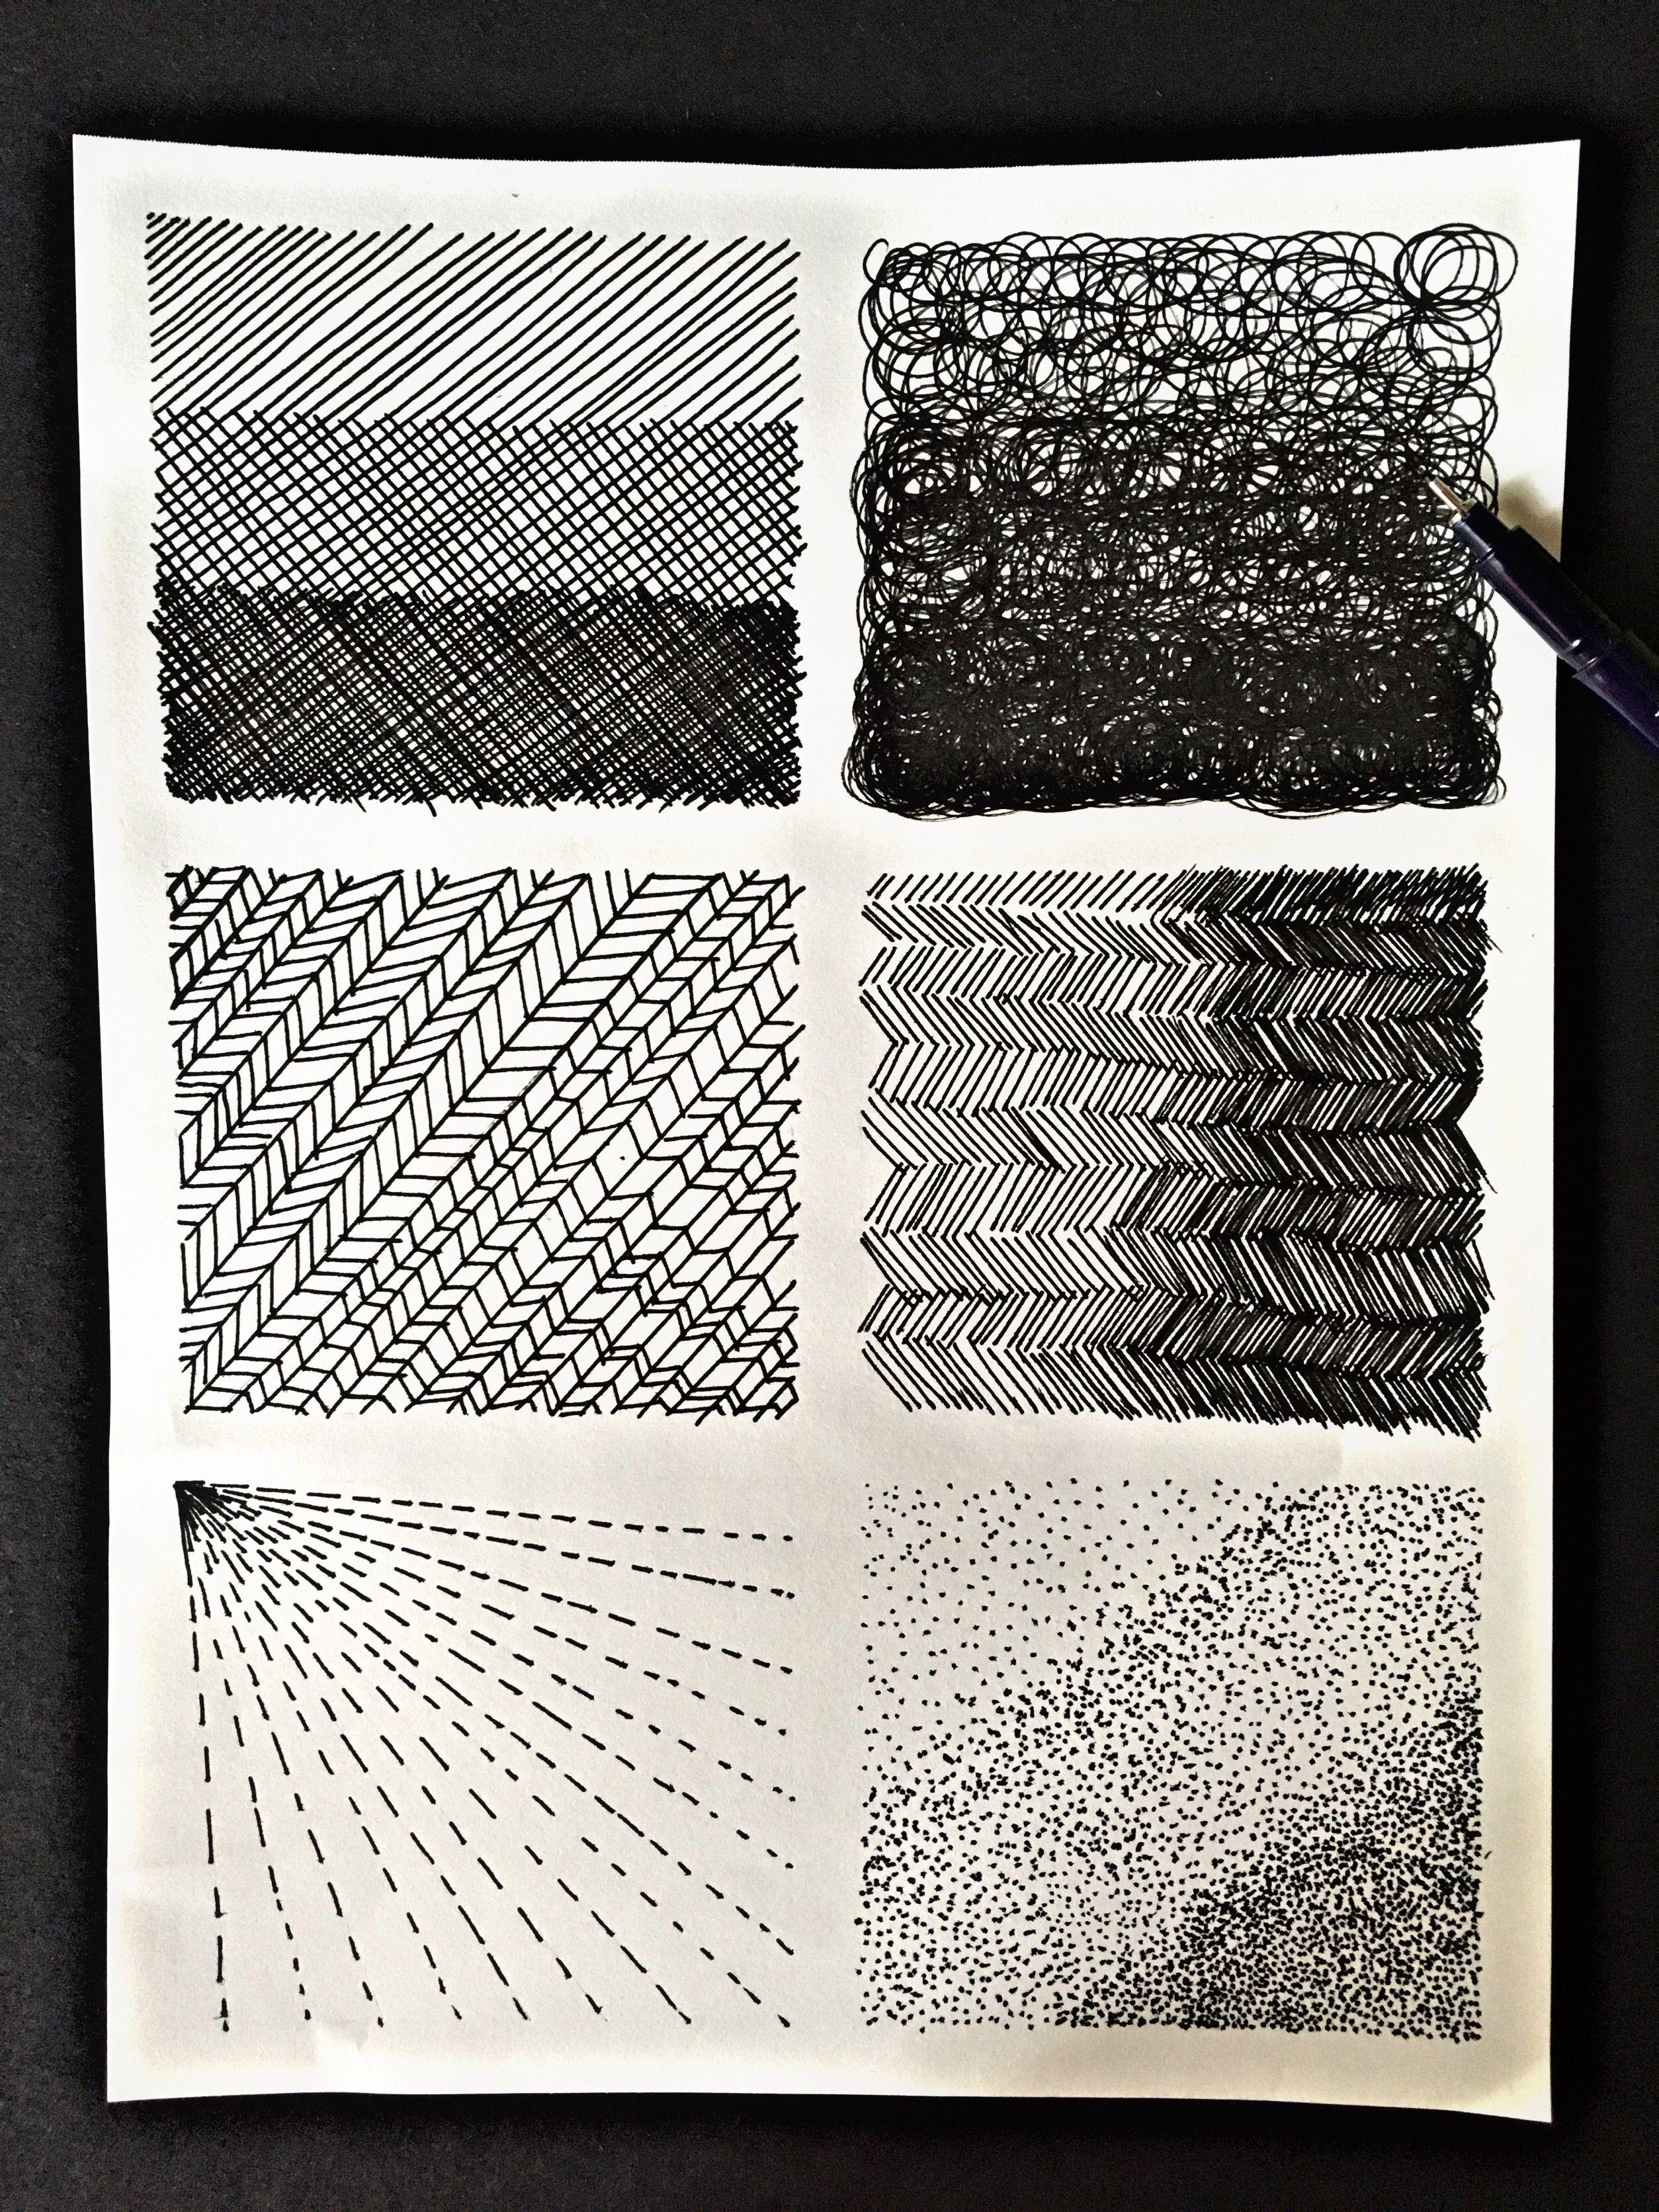 Achurado Tiralineas Achurado Dibujos Simples Texturas